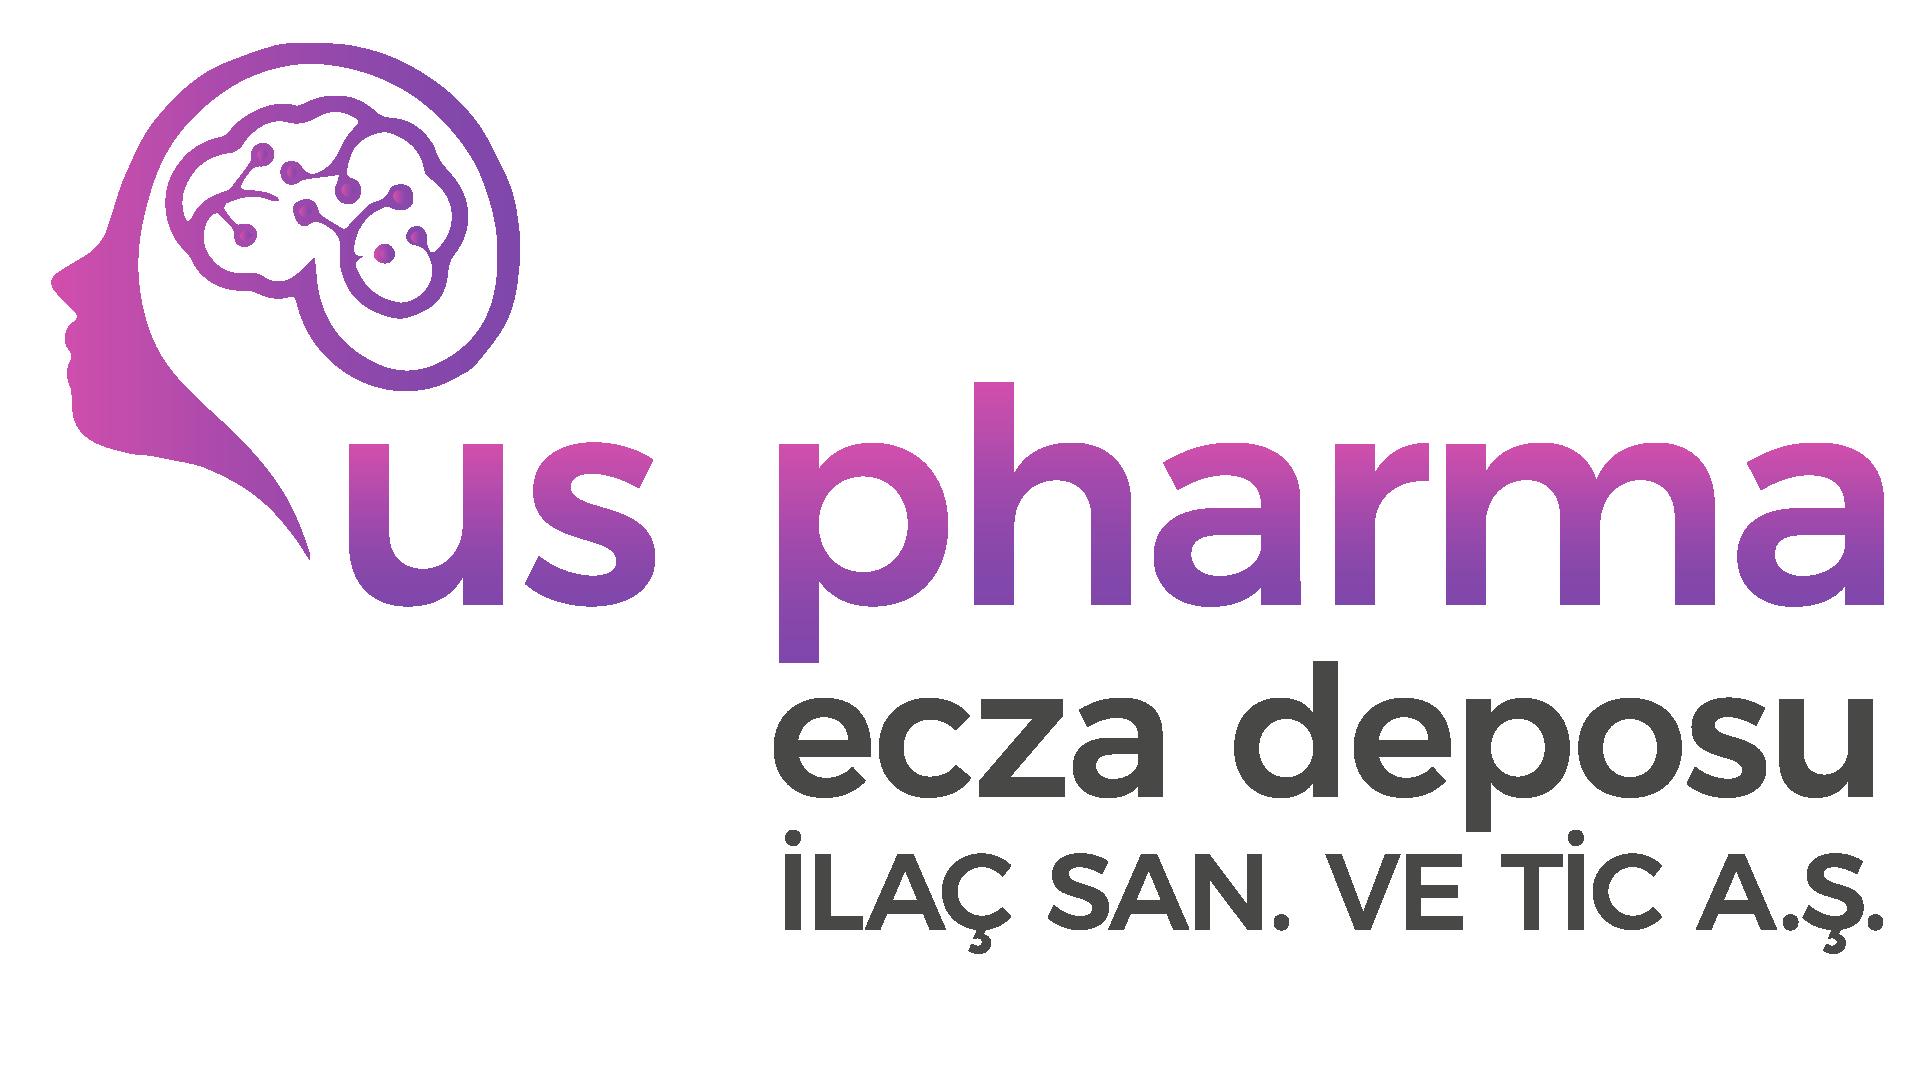 US Pharma Ecza Deposu